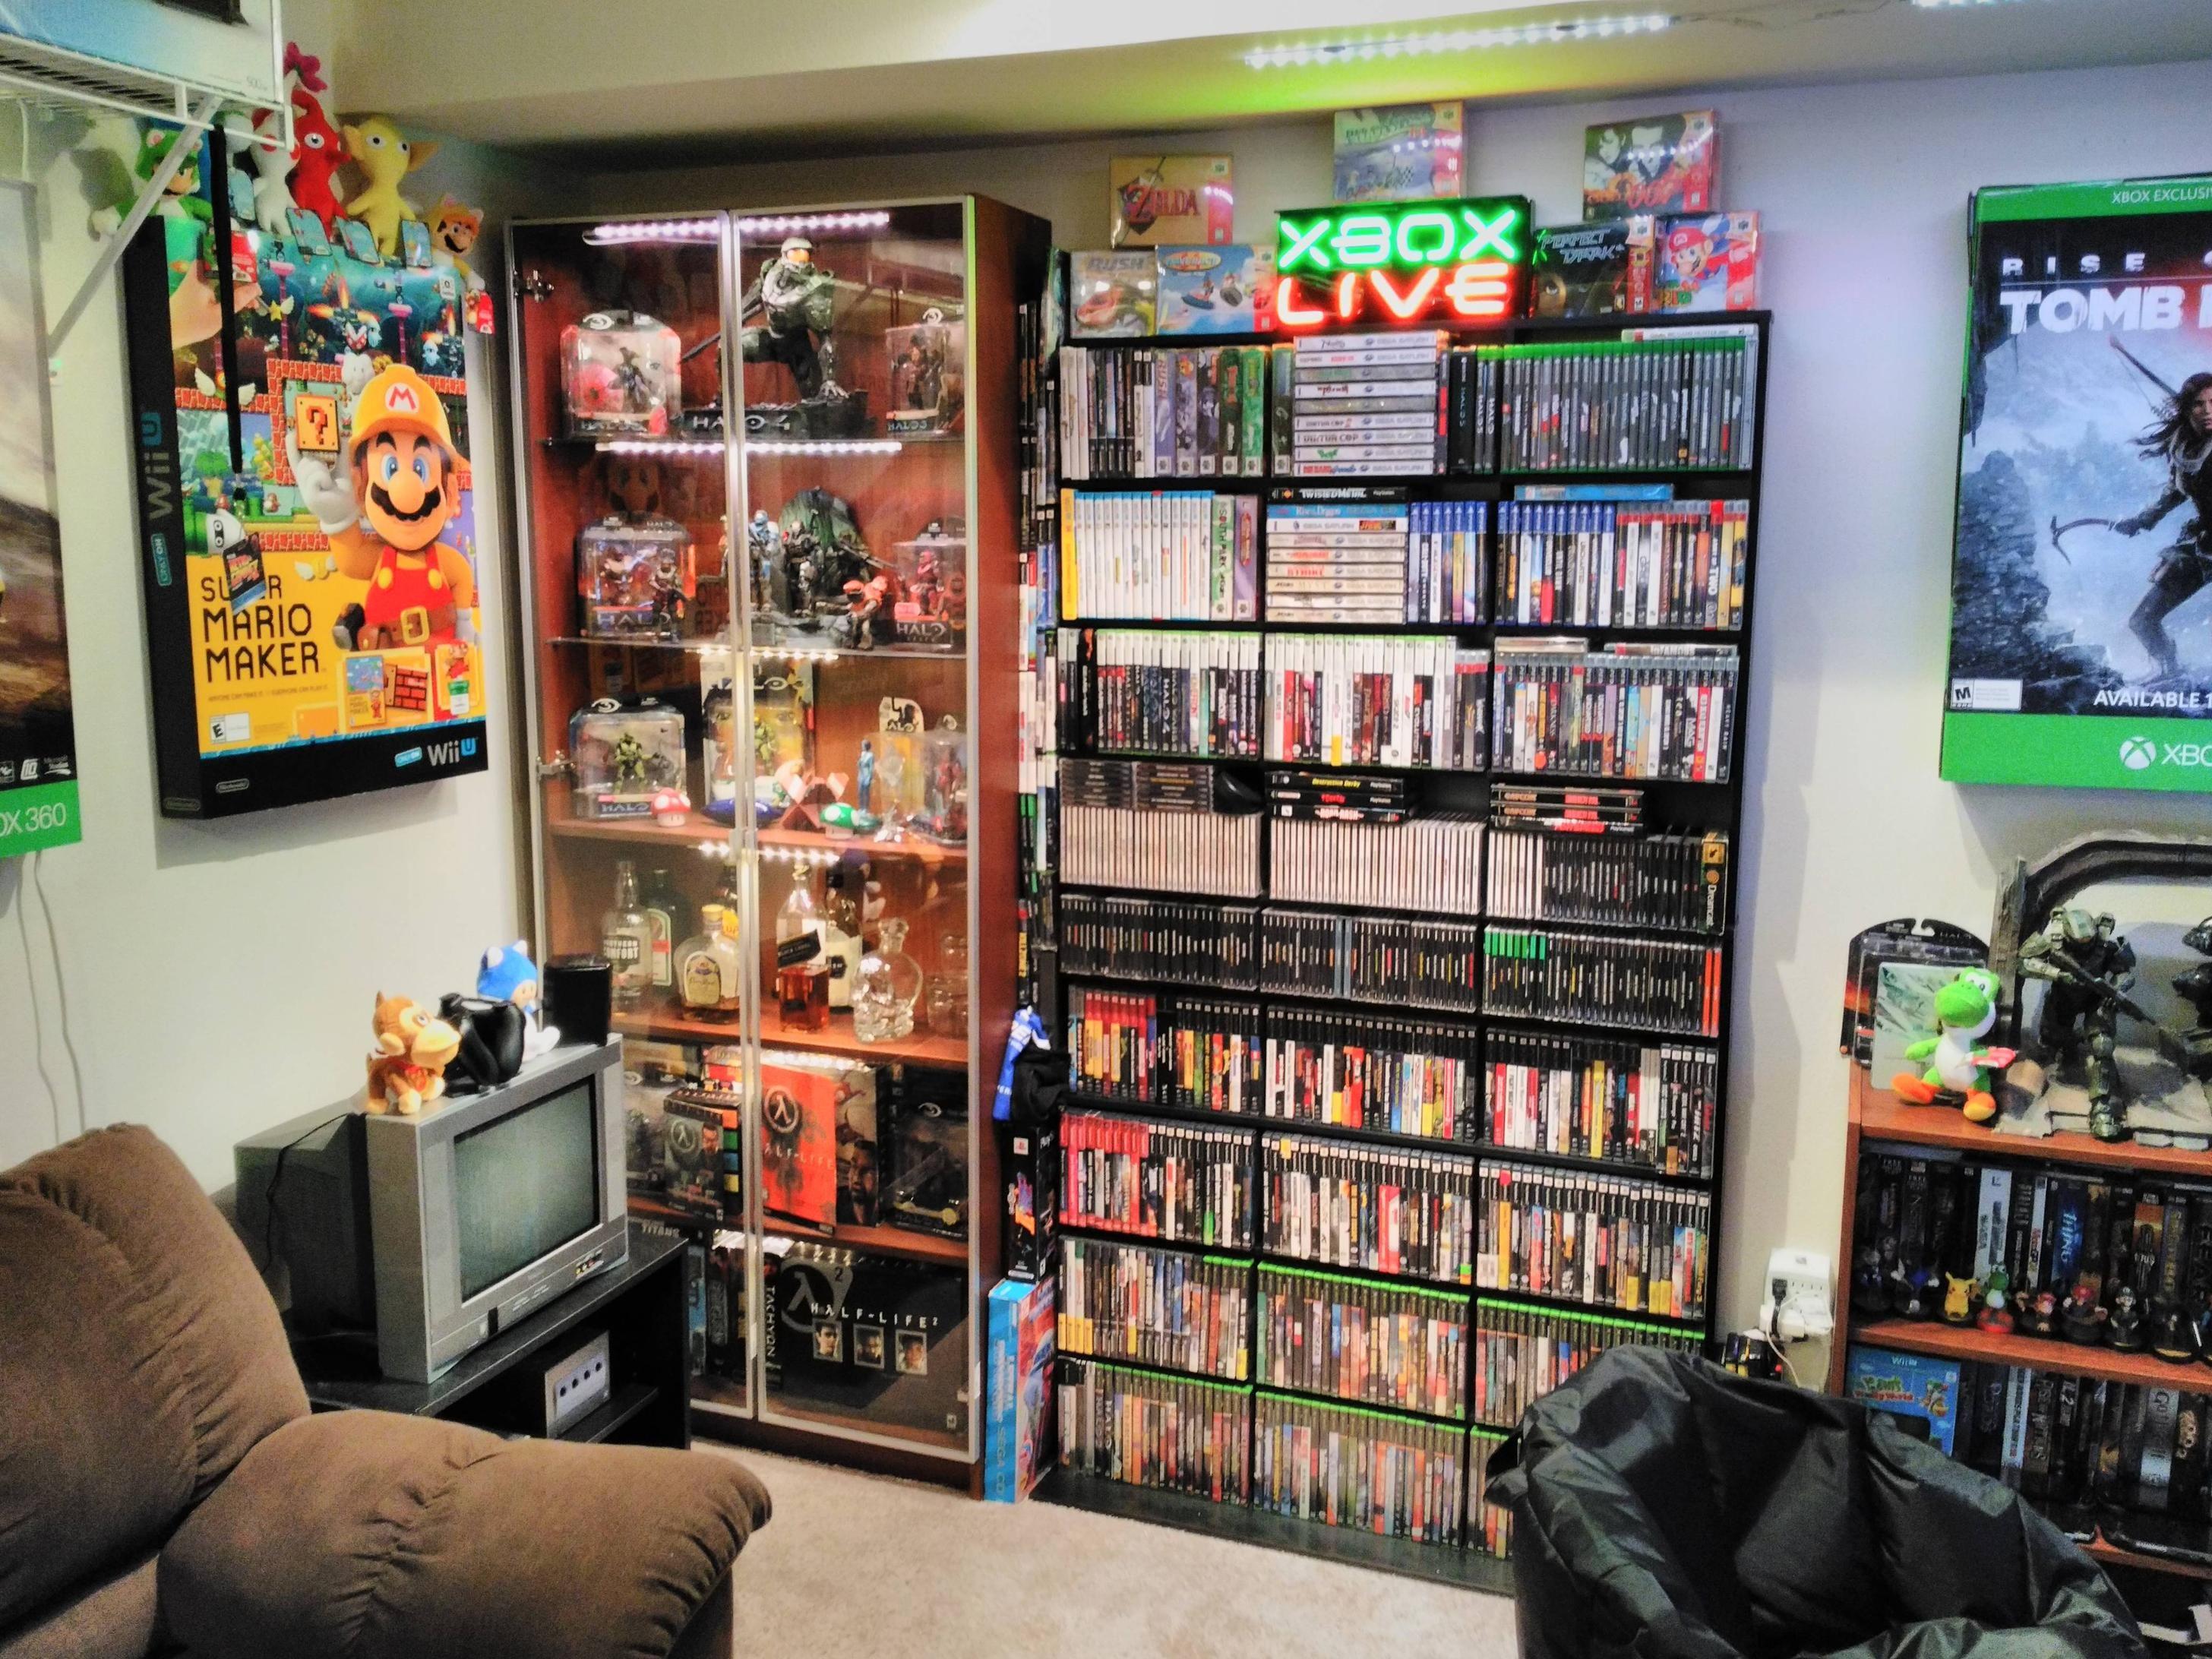 Nya S Game Room 2016 Gamer Room Game Room Game Room Decor